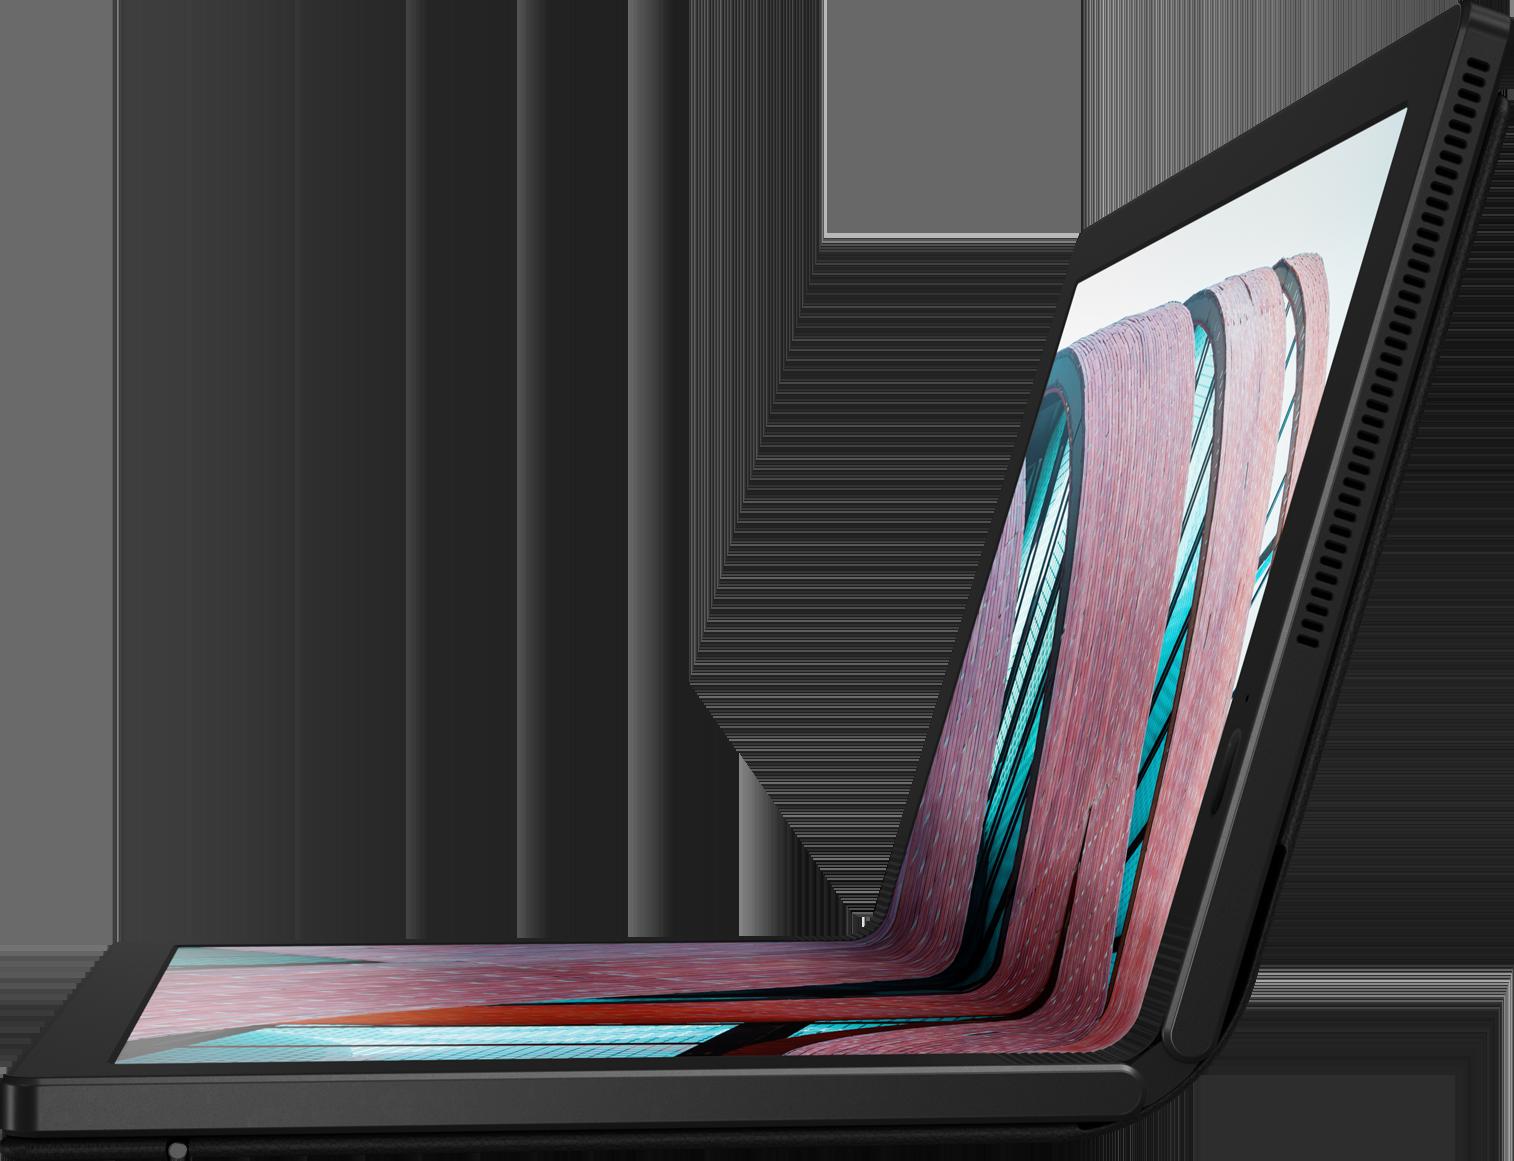 Lenovo ThinkPad X1 Fold 13.3 20RK000PUS Foldable PC